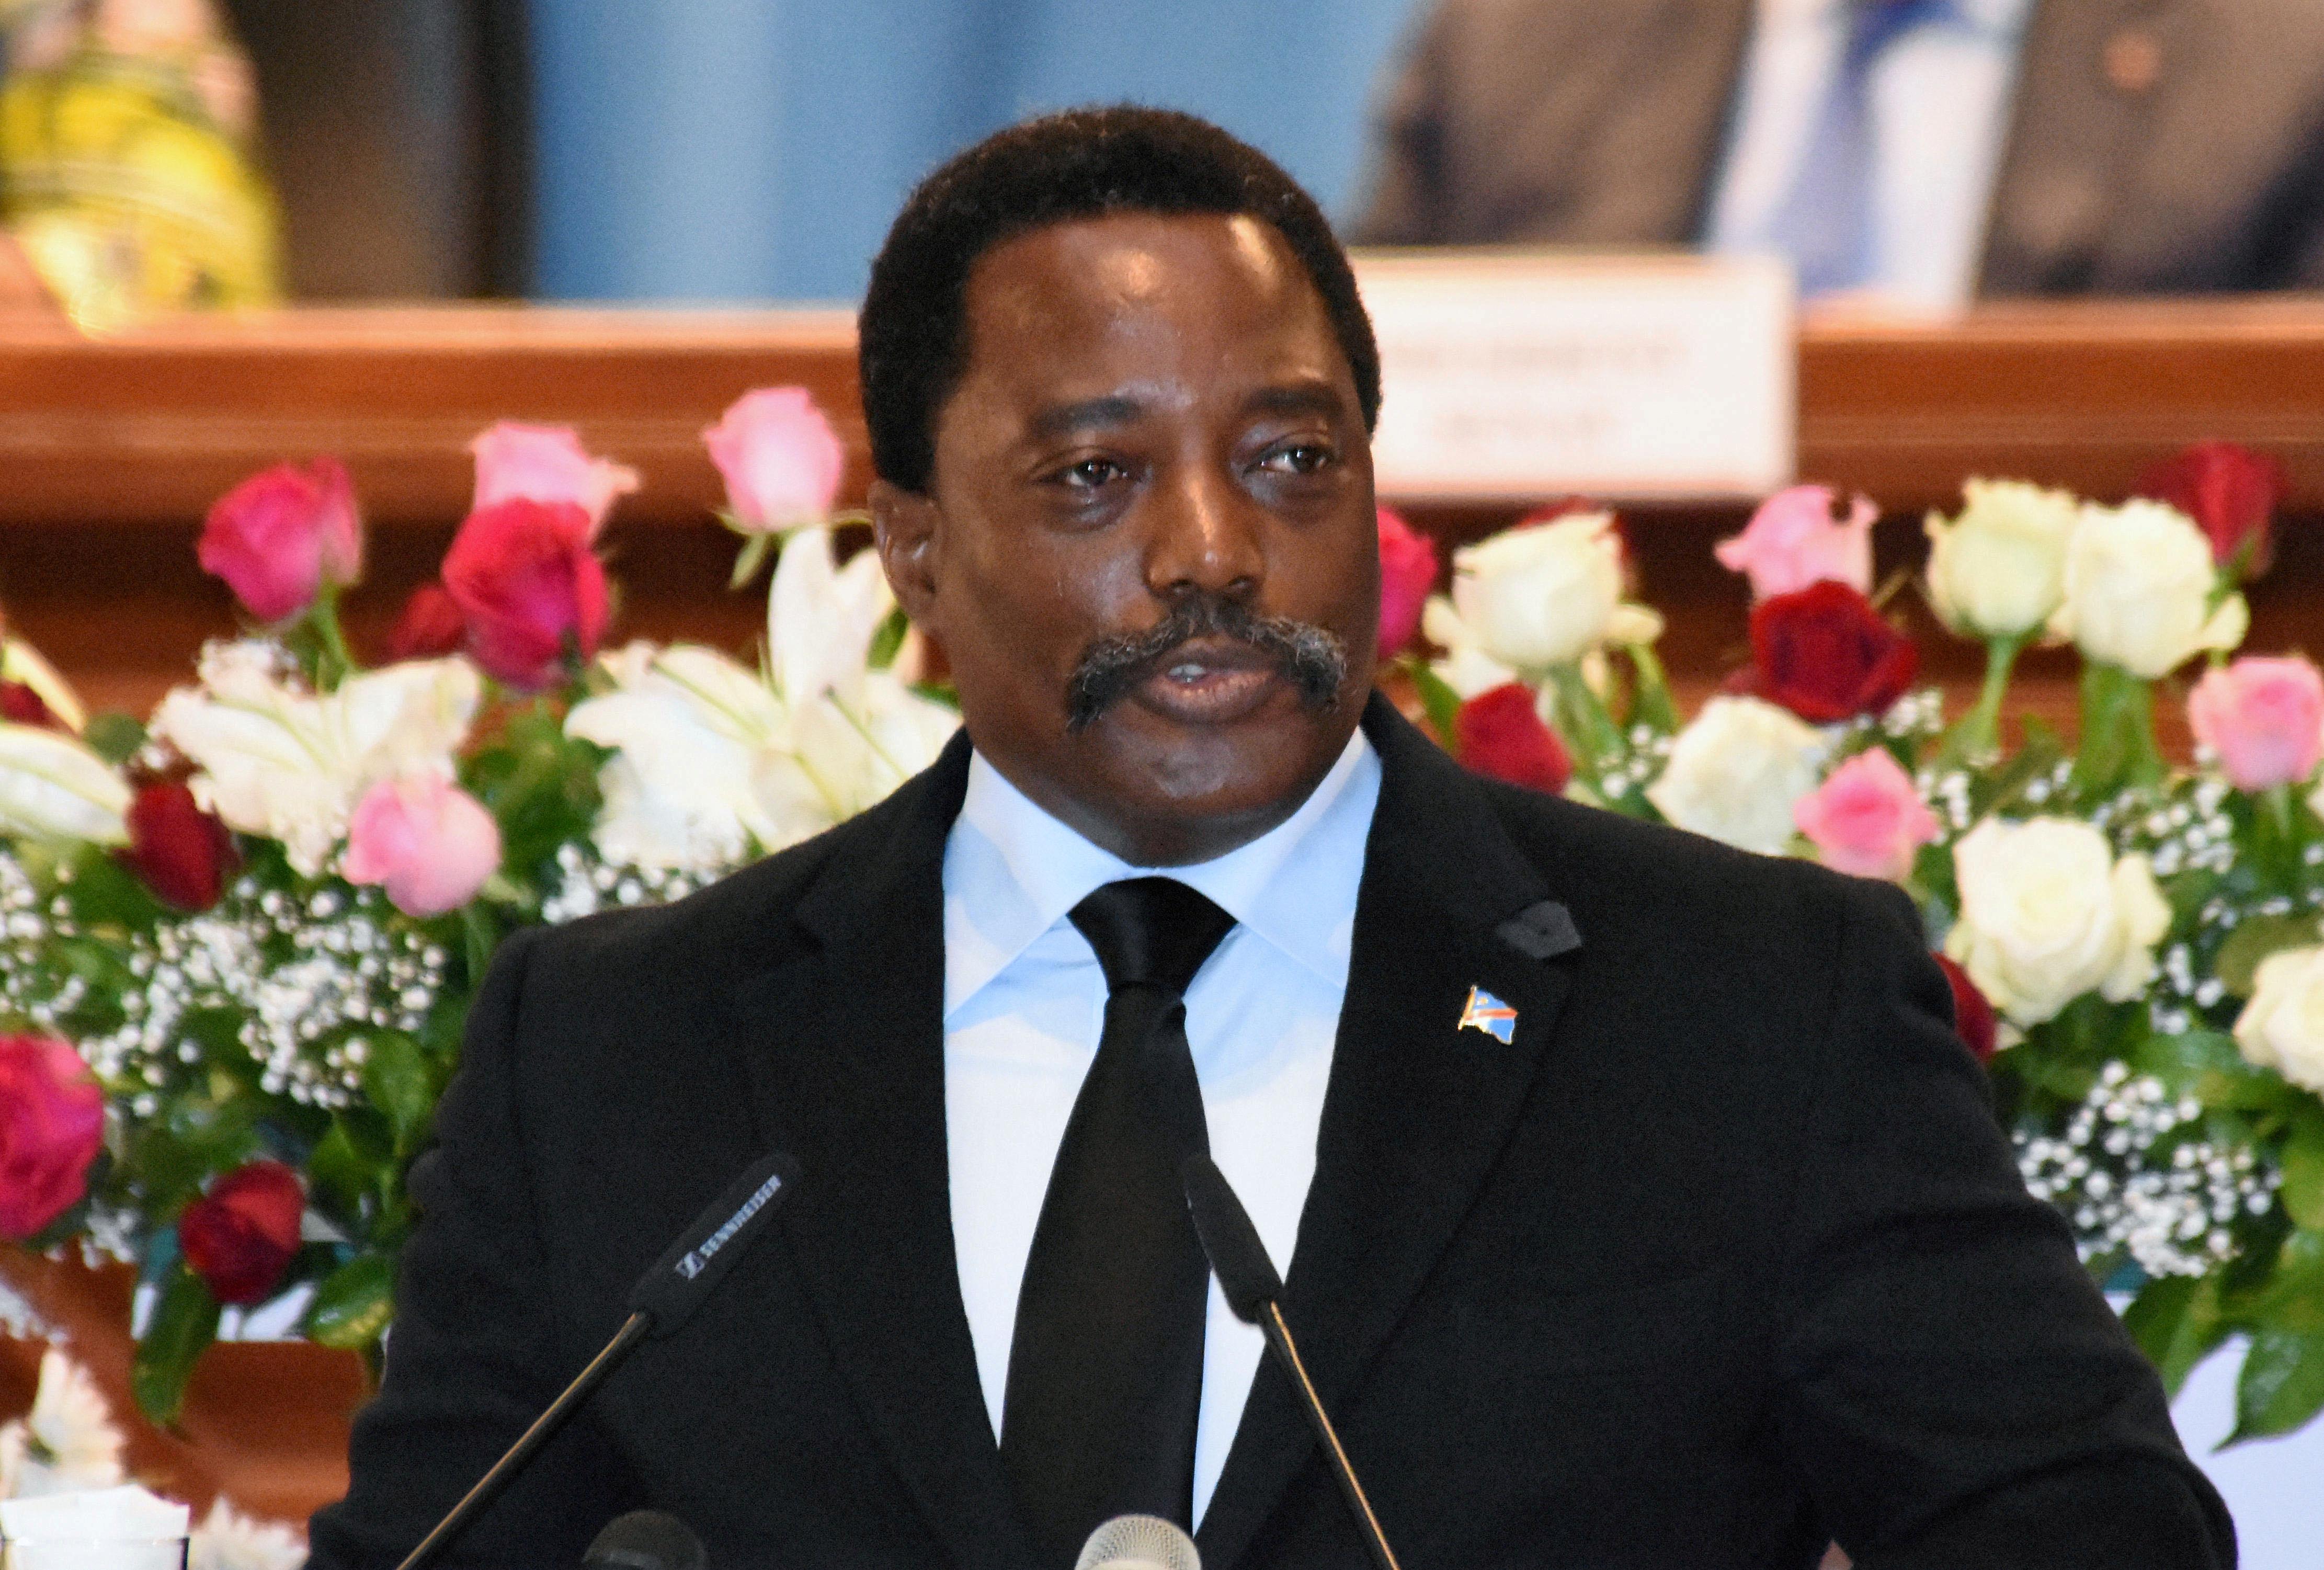 Democratic Republic of Congo's President Joseph Kabila addresses the nation at Palais du Peuple in Kinshasa, Democratic Republic of Congo April 5, 2017.